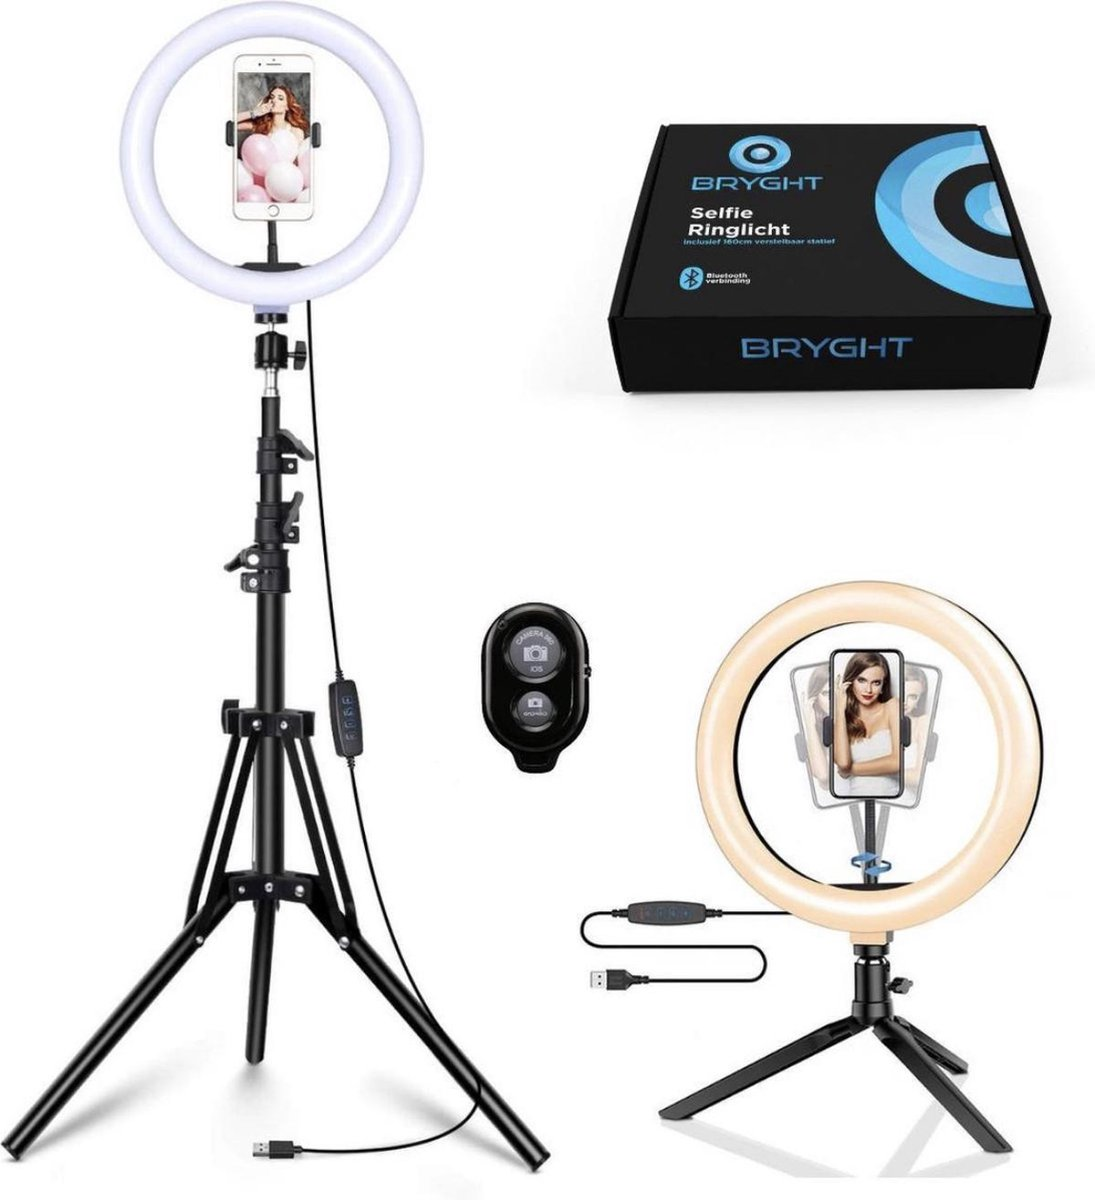 BRYGHT 10 Inch LED Licht - Smartphone Statief - Ringlamp - TikTok - Ringlight met statief - 160cm st